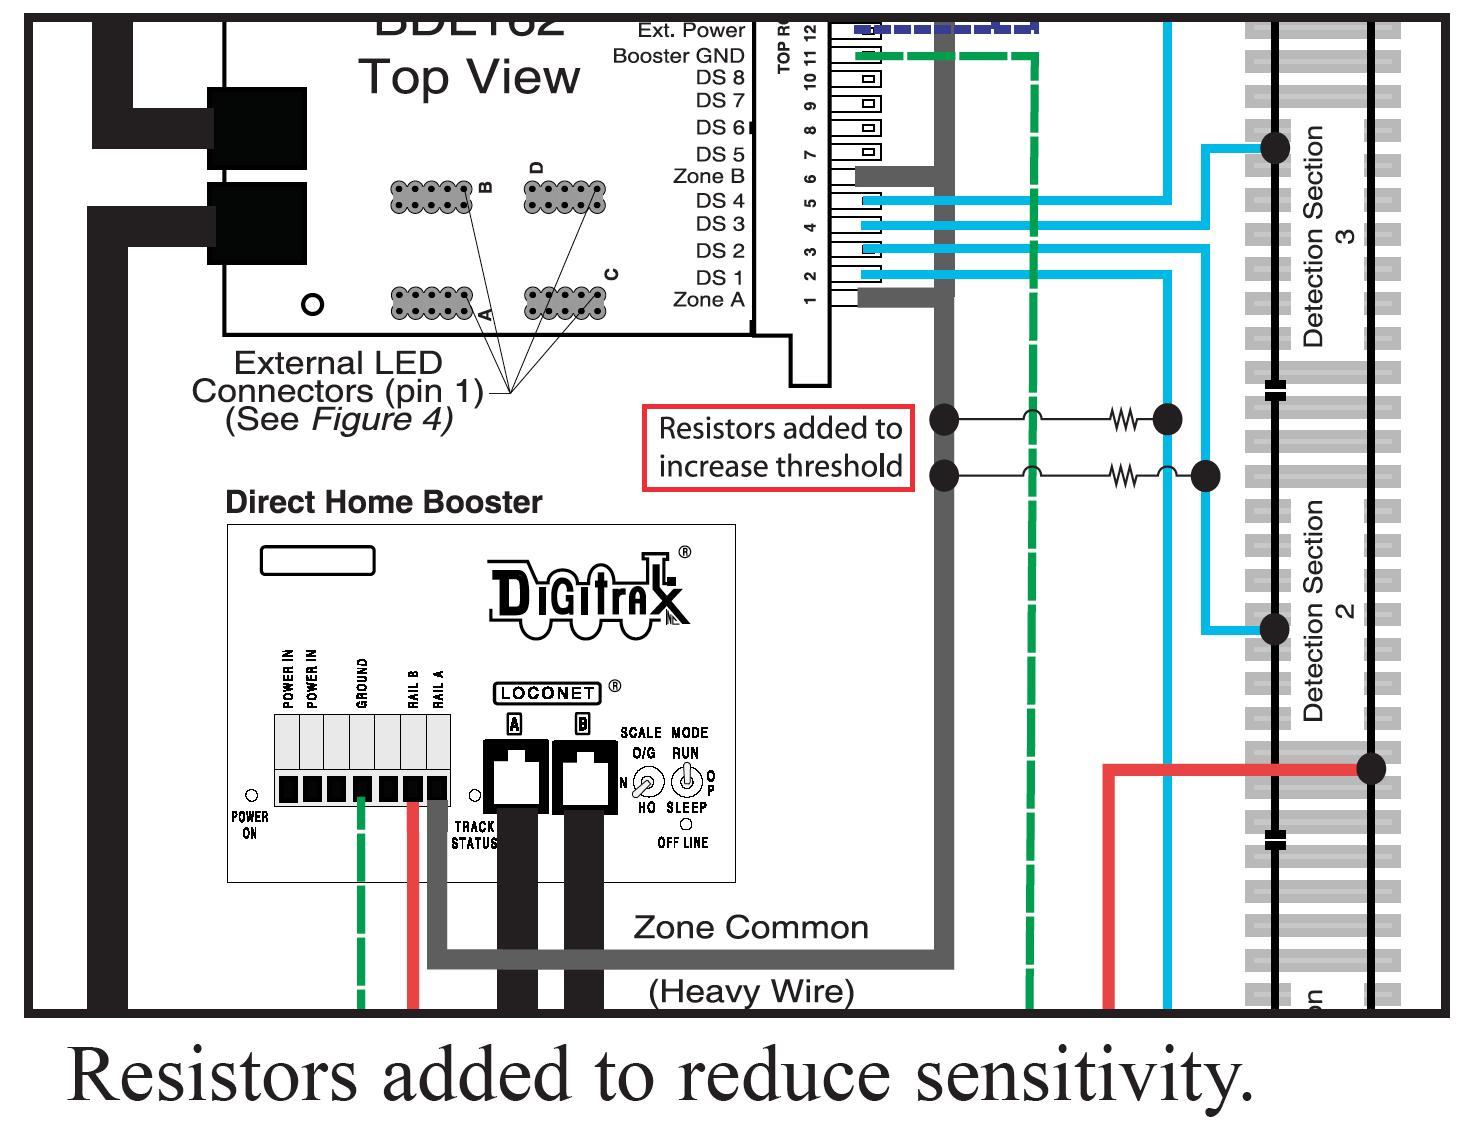 KX_2518] Dcc Bdl 168 Wiring Diagram Free DiagramSianu Emba Mohammedshrine Librar Wiring 101